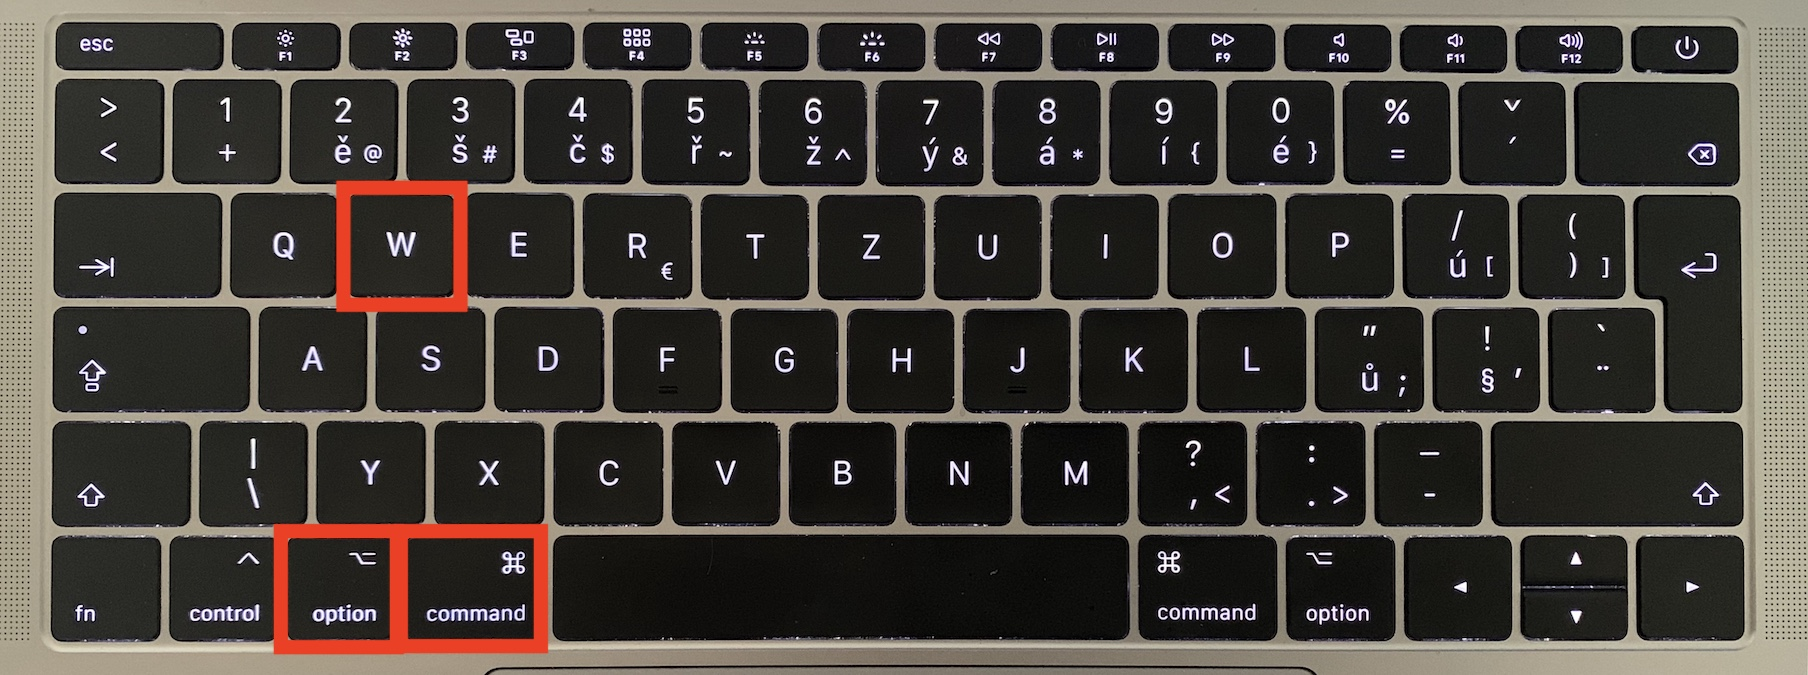 command option w